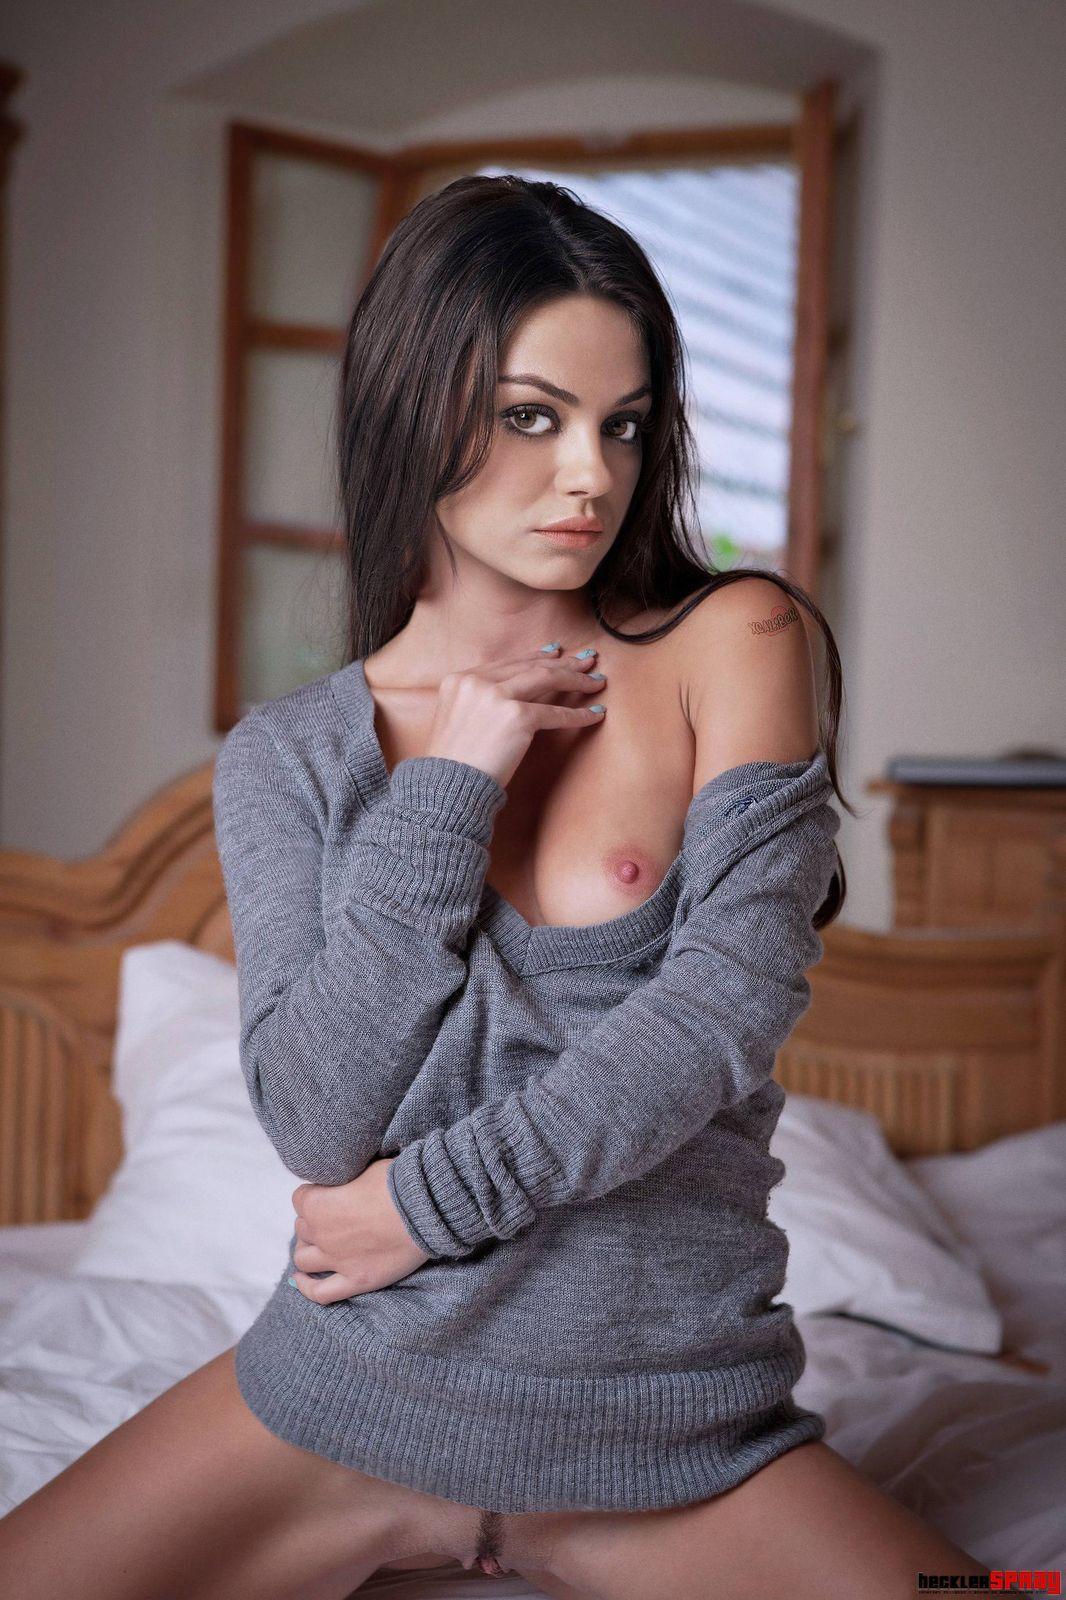 Mila kunis leaked sexy